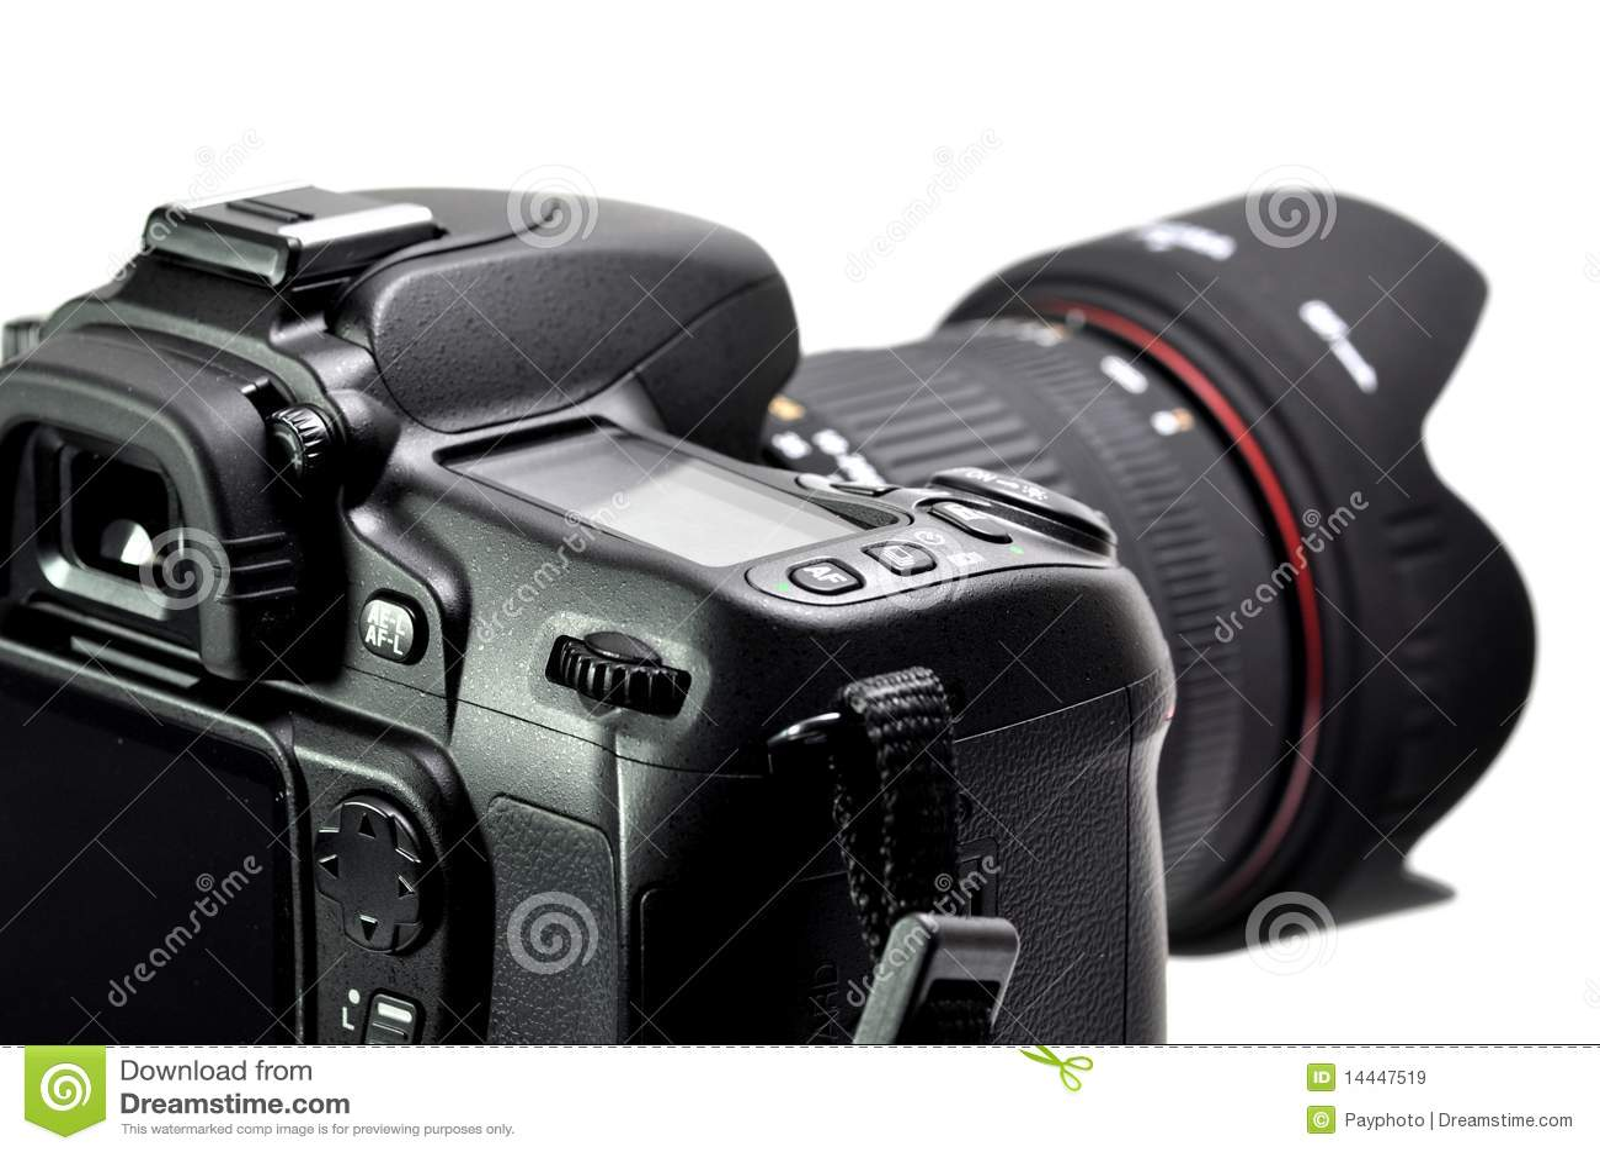 Professional Digital Camera Royalty Free Stock Images ...